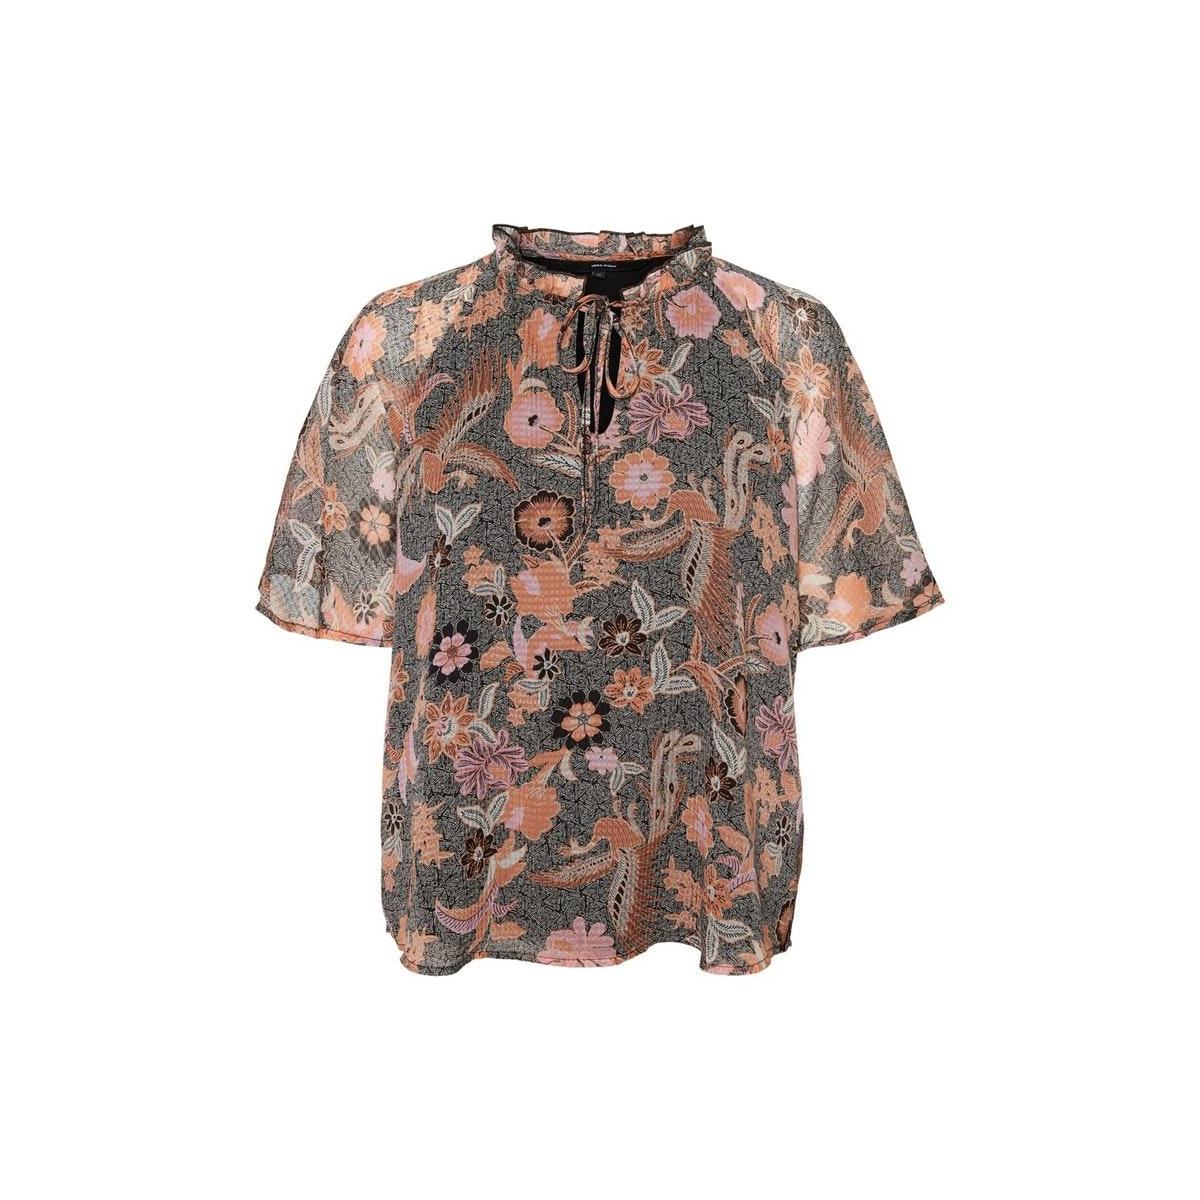 vmnuka s/s top wvn 10230397 vero moda blouse carnelian/nuka